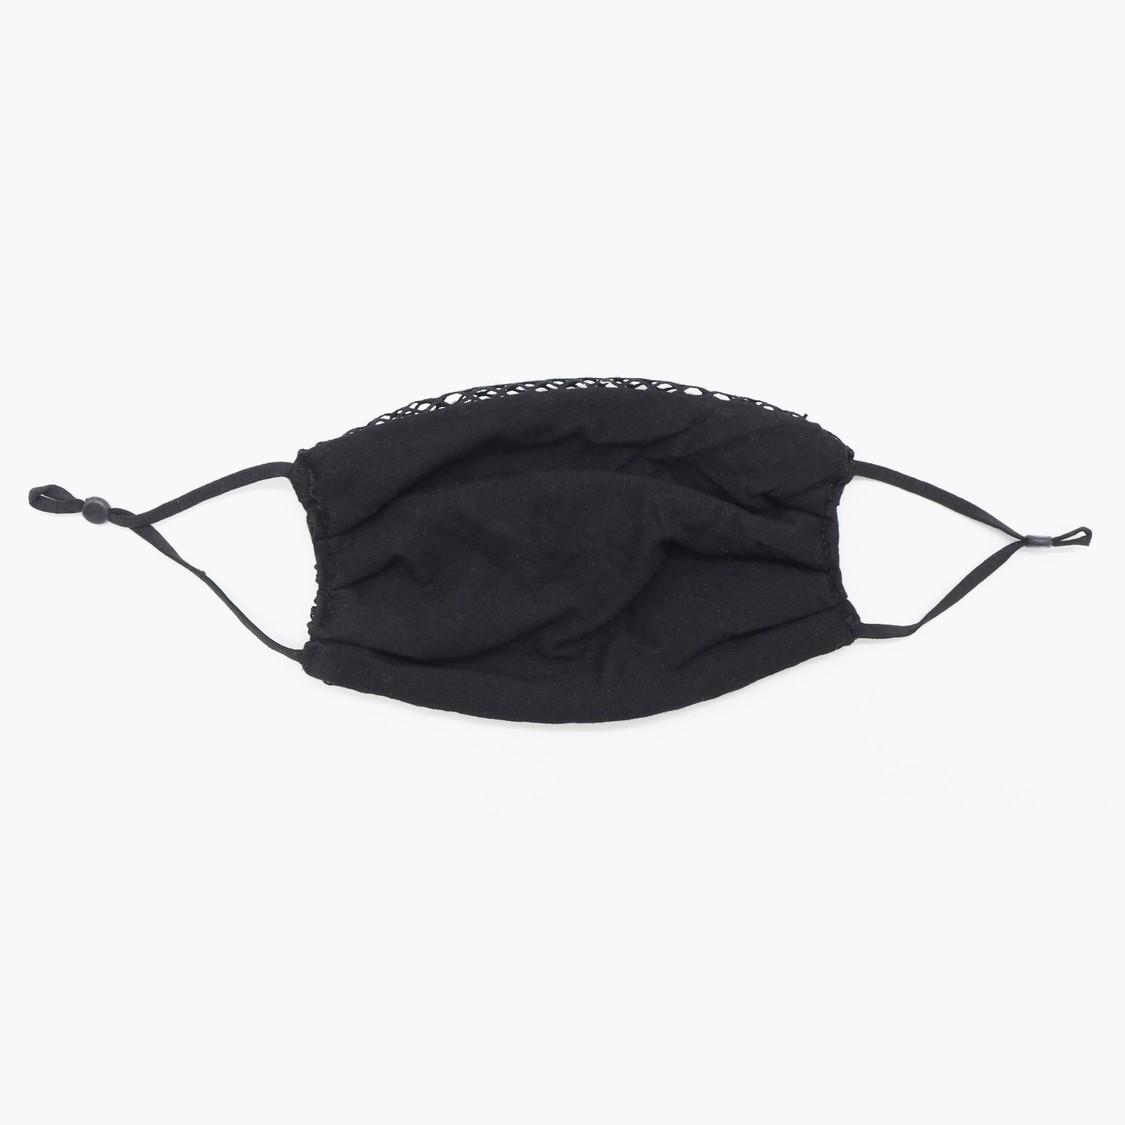 Textured Anti-Dust Reusable Mask